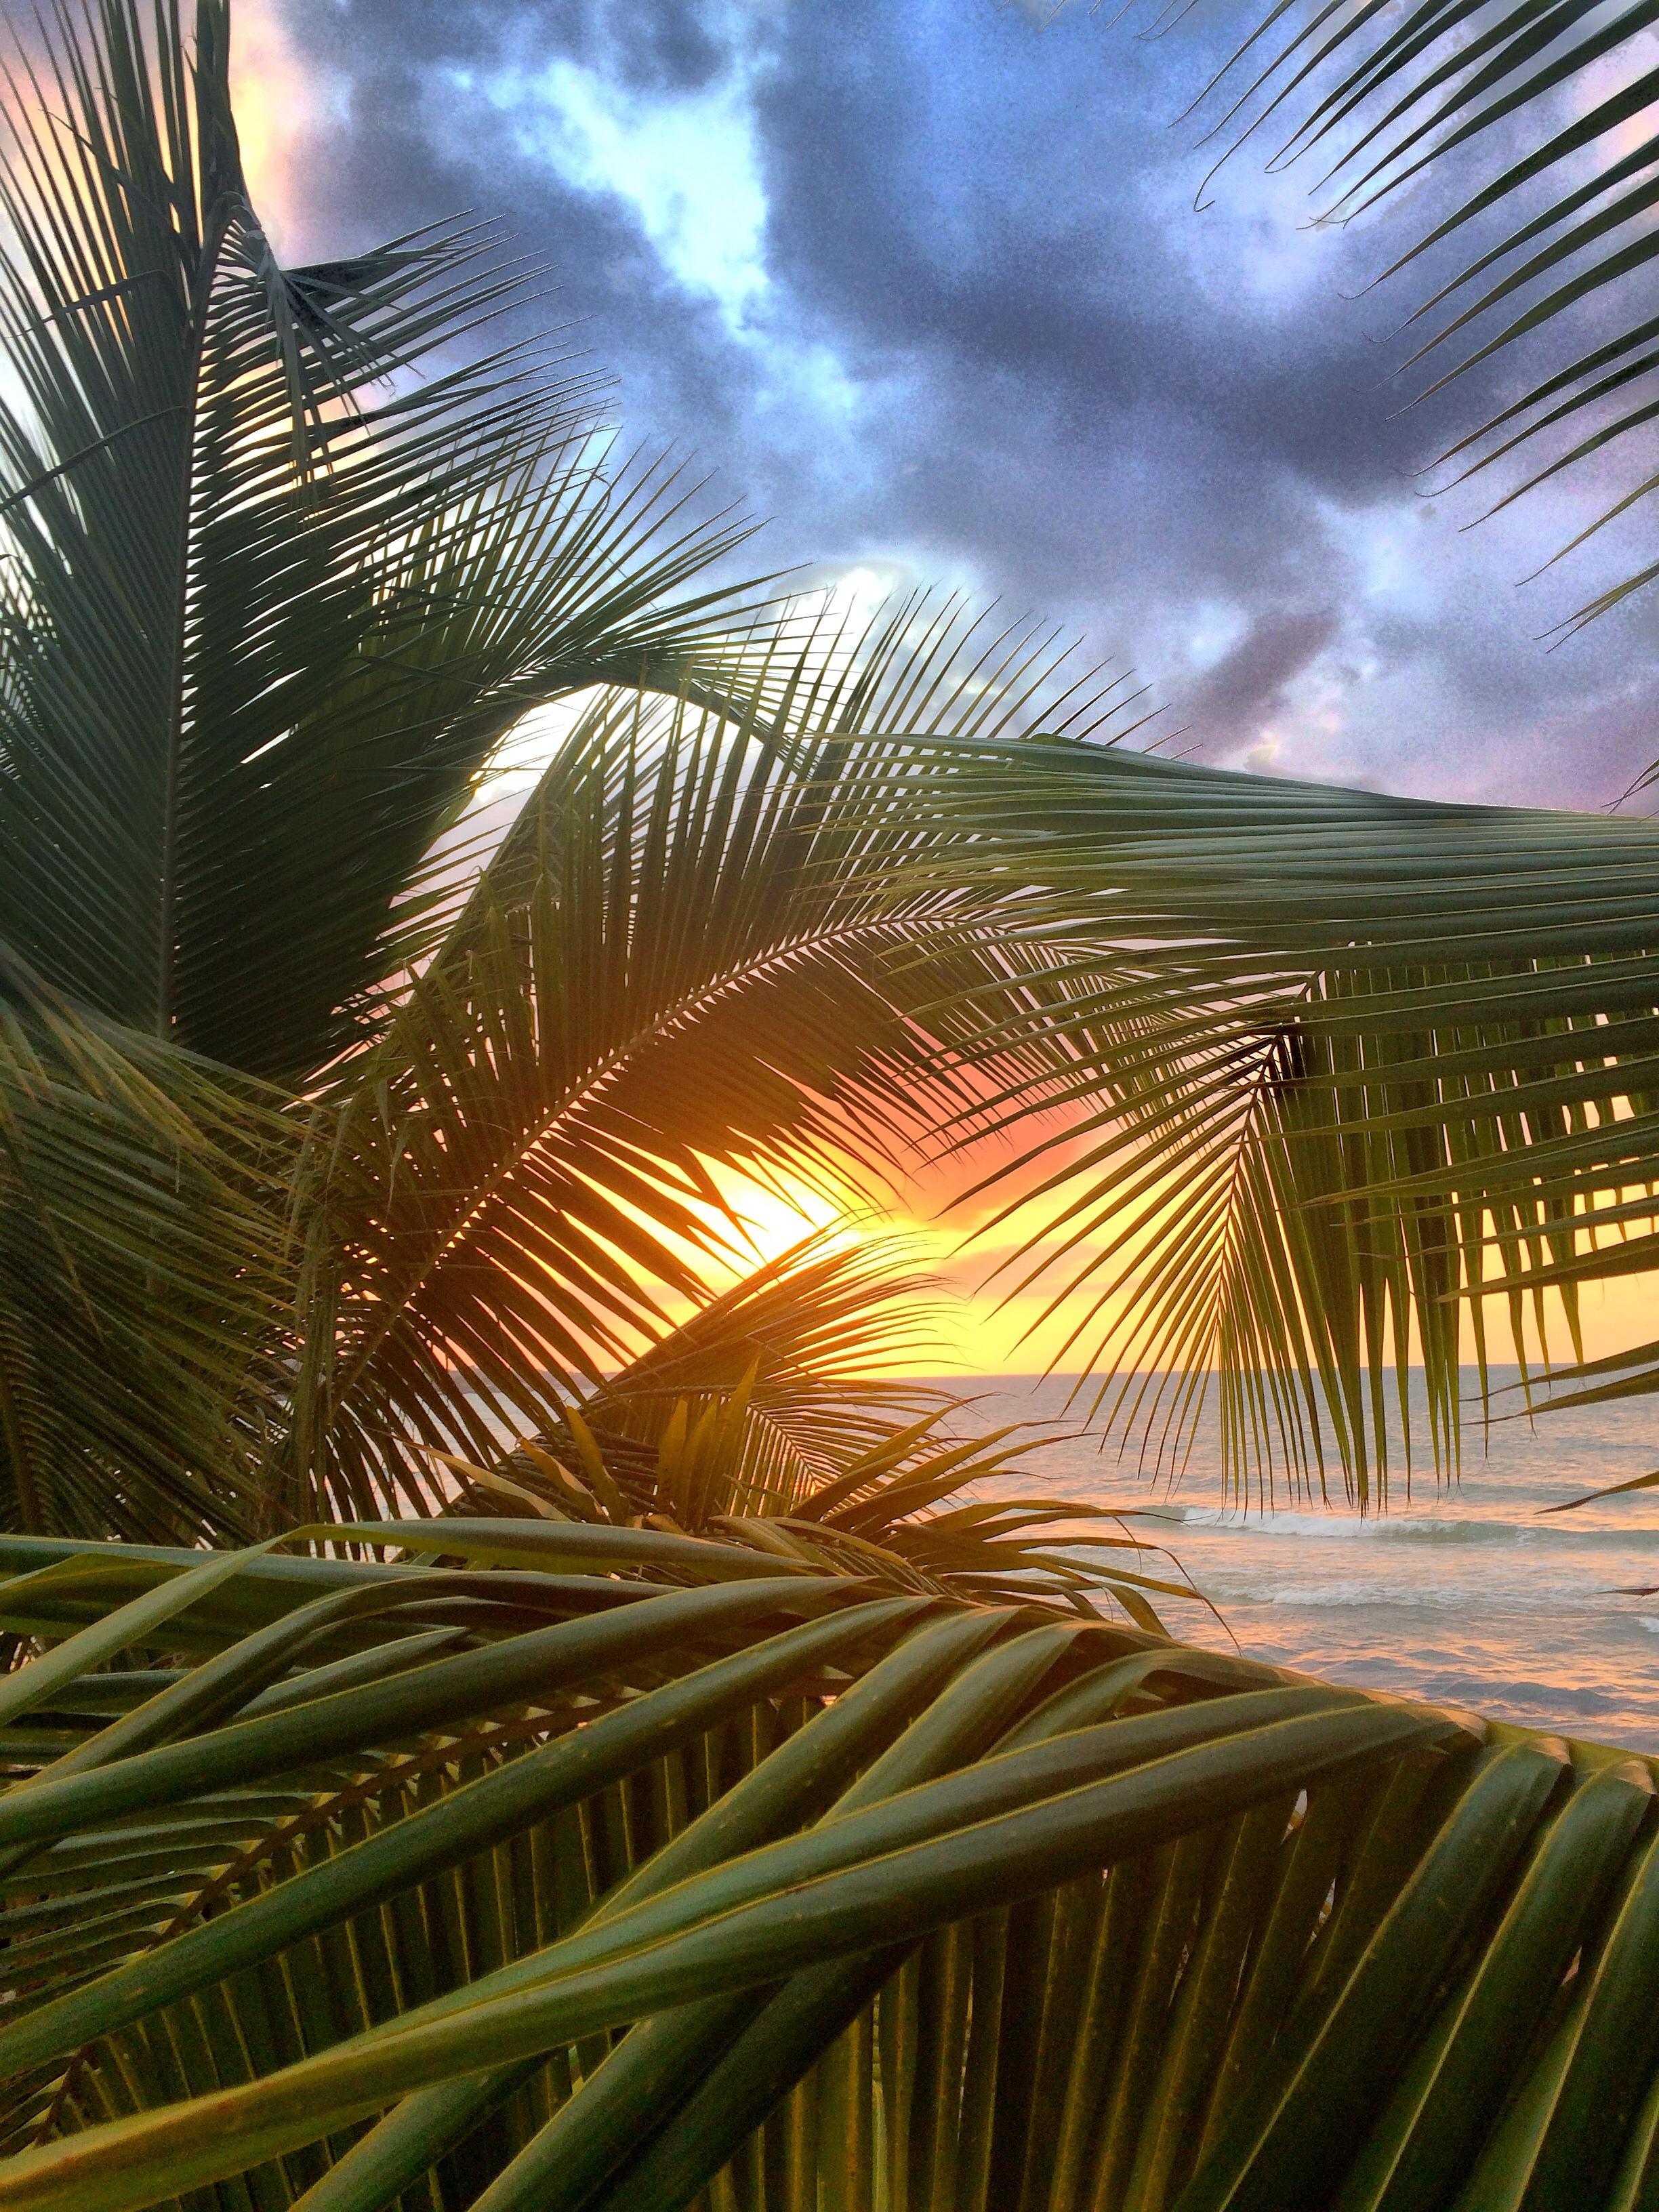 palmsolnedgång.jpg